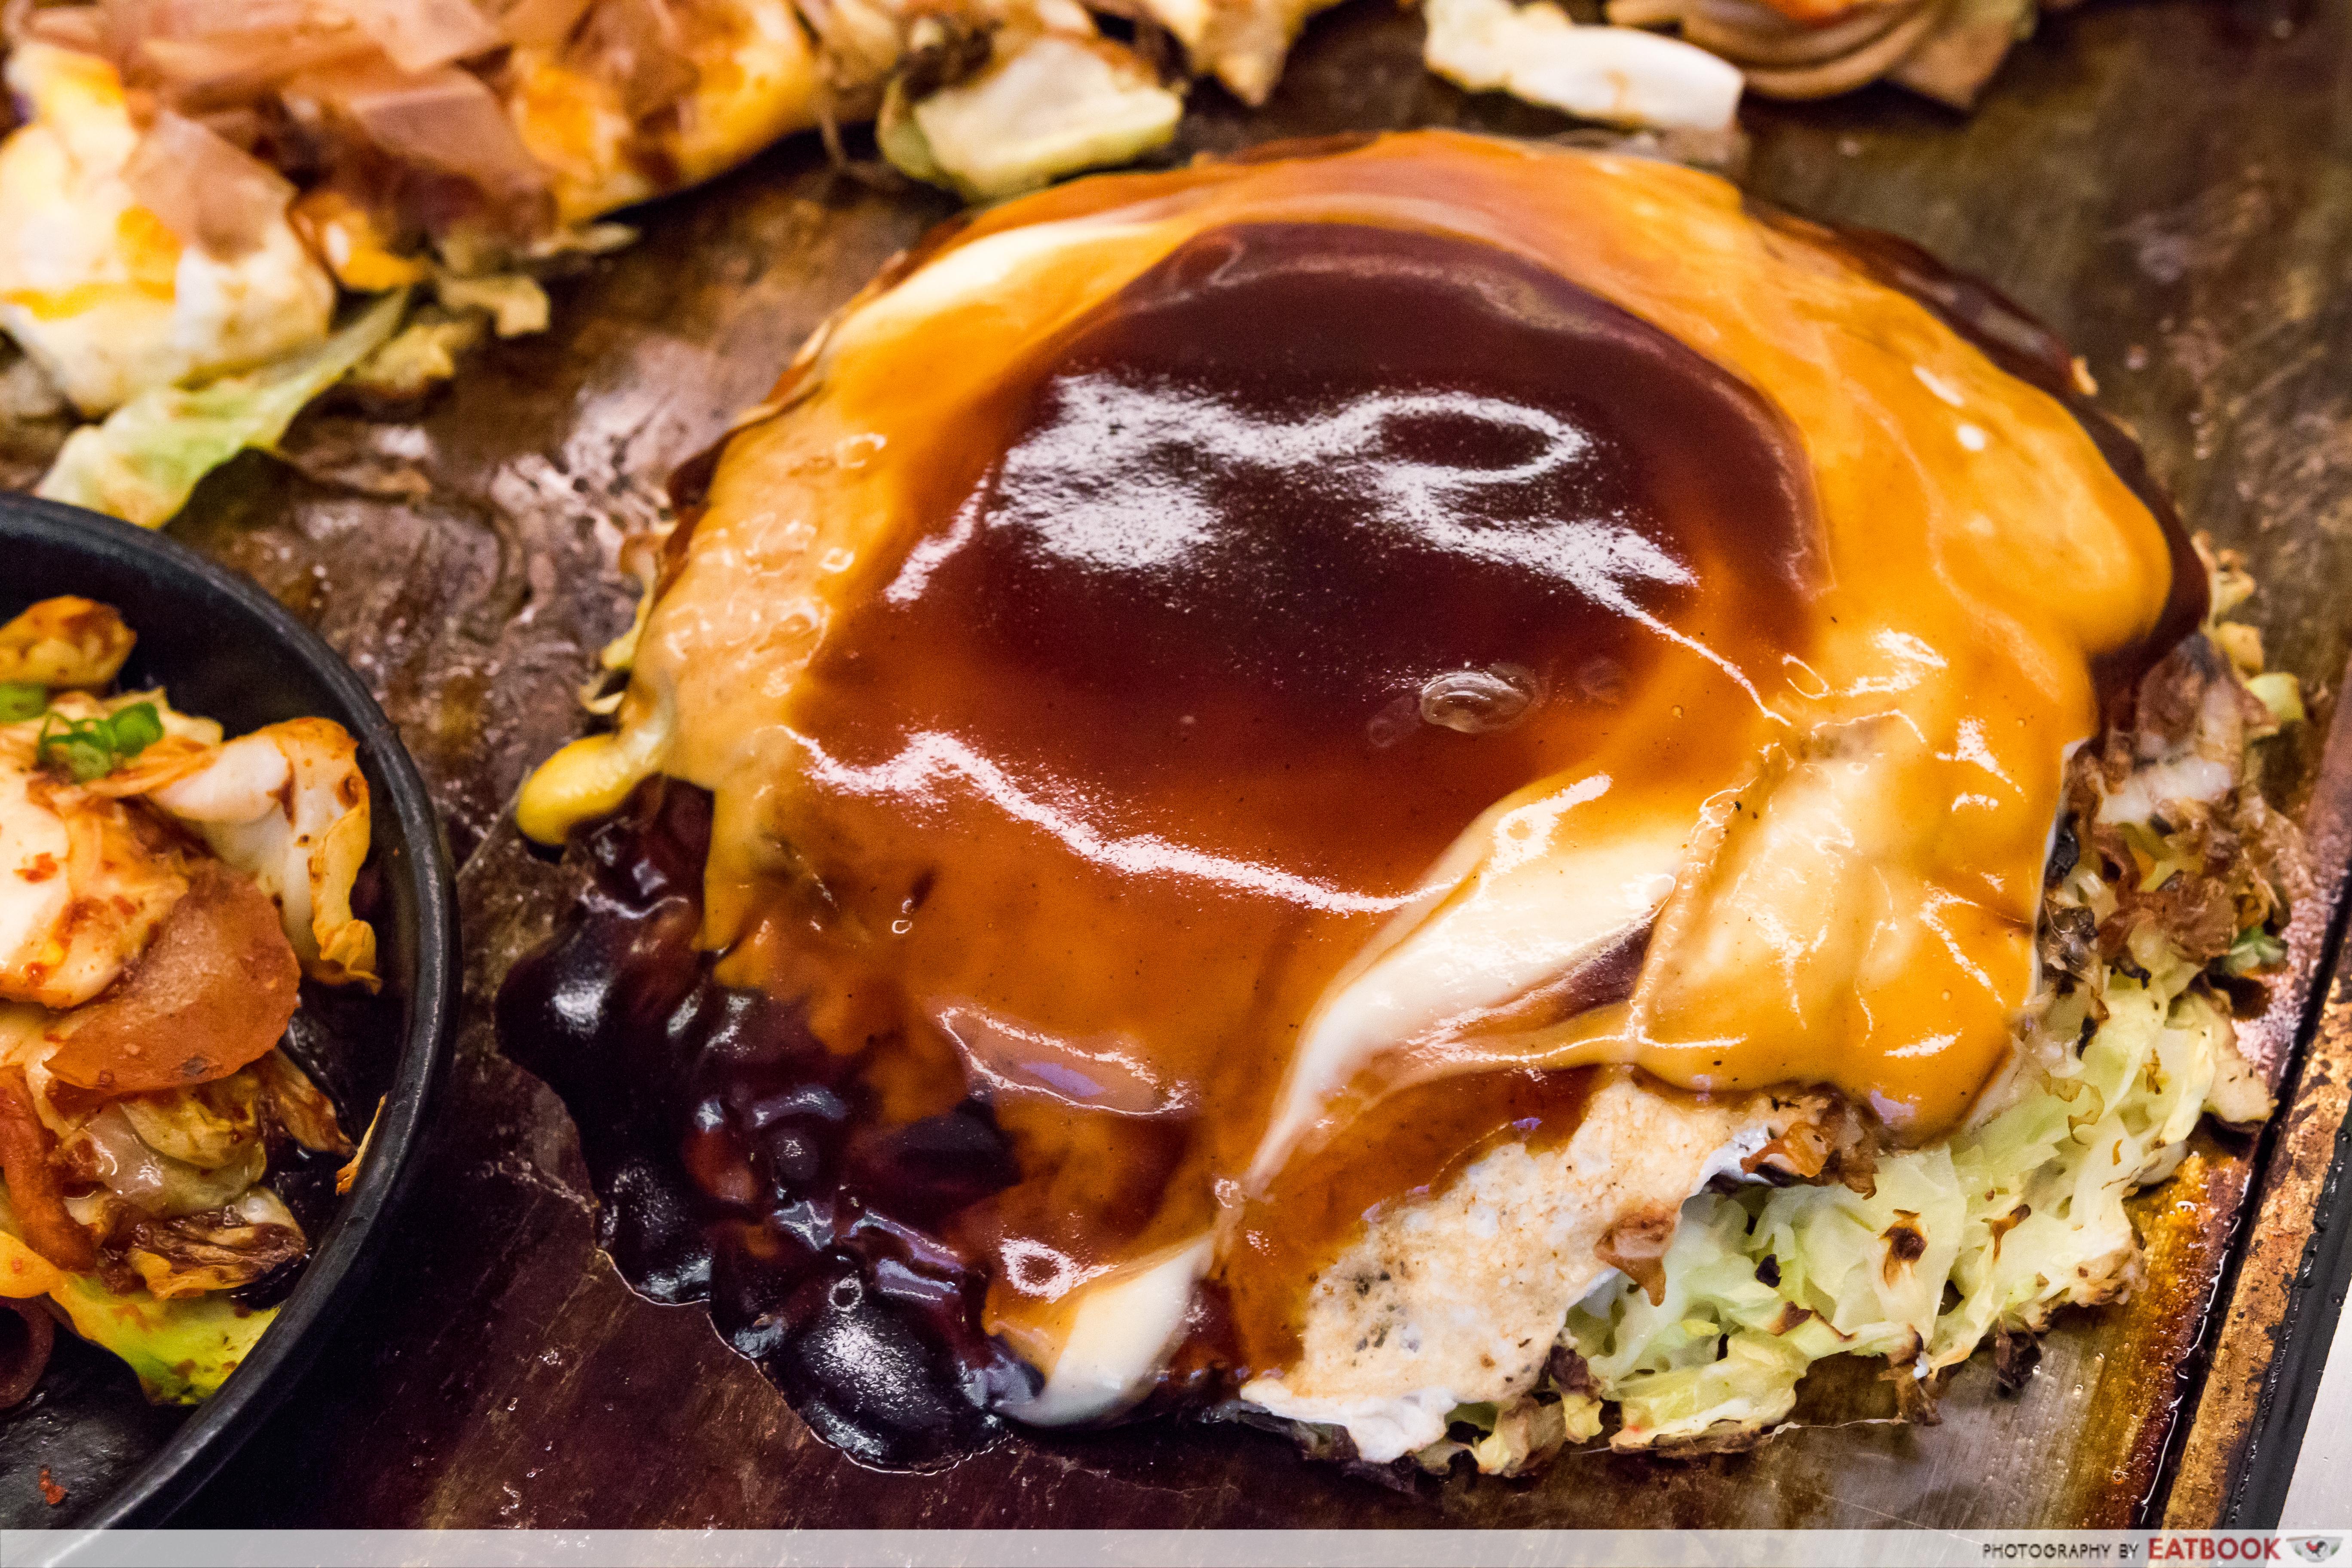 Fugetsu- okonomiyaki